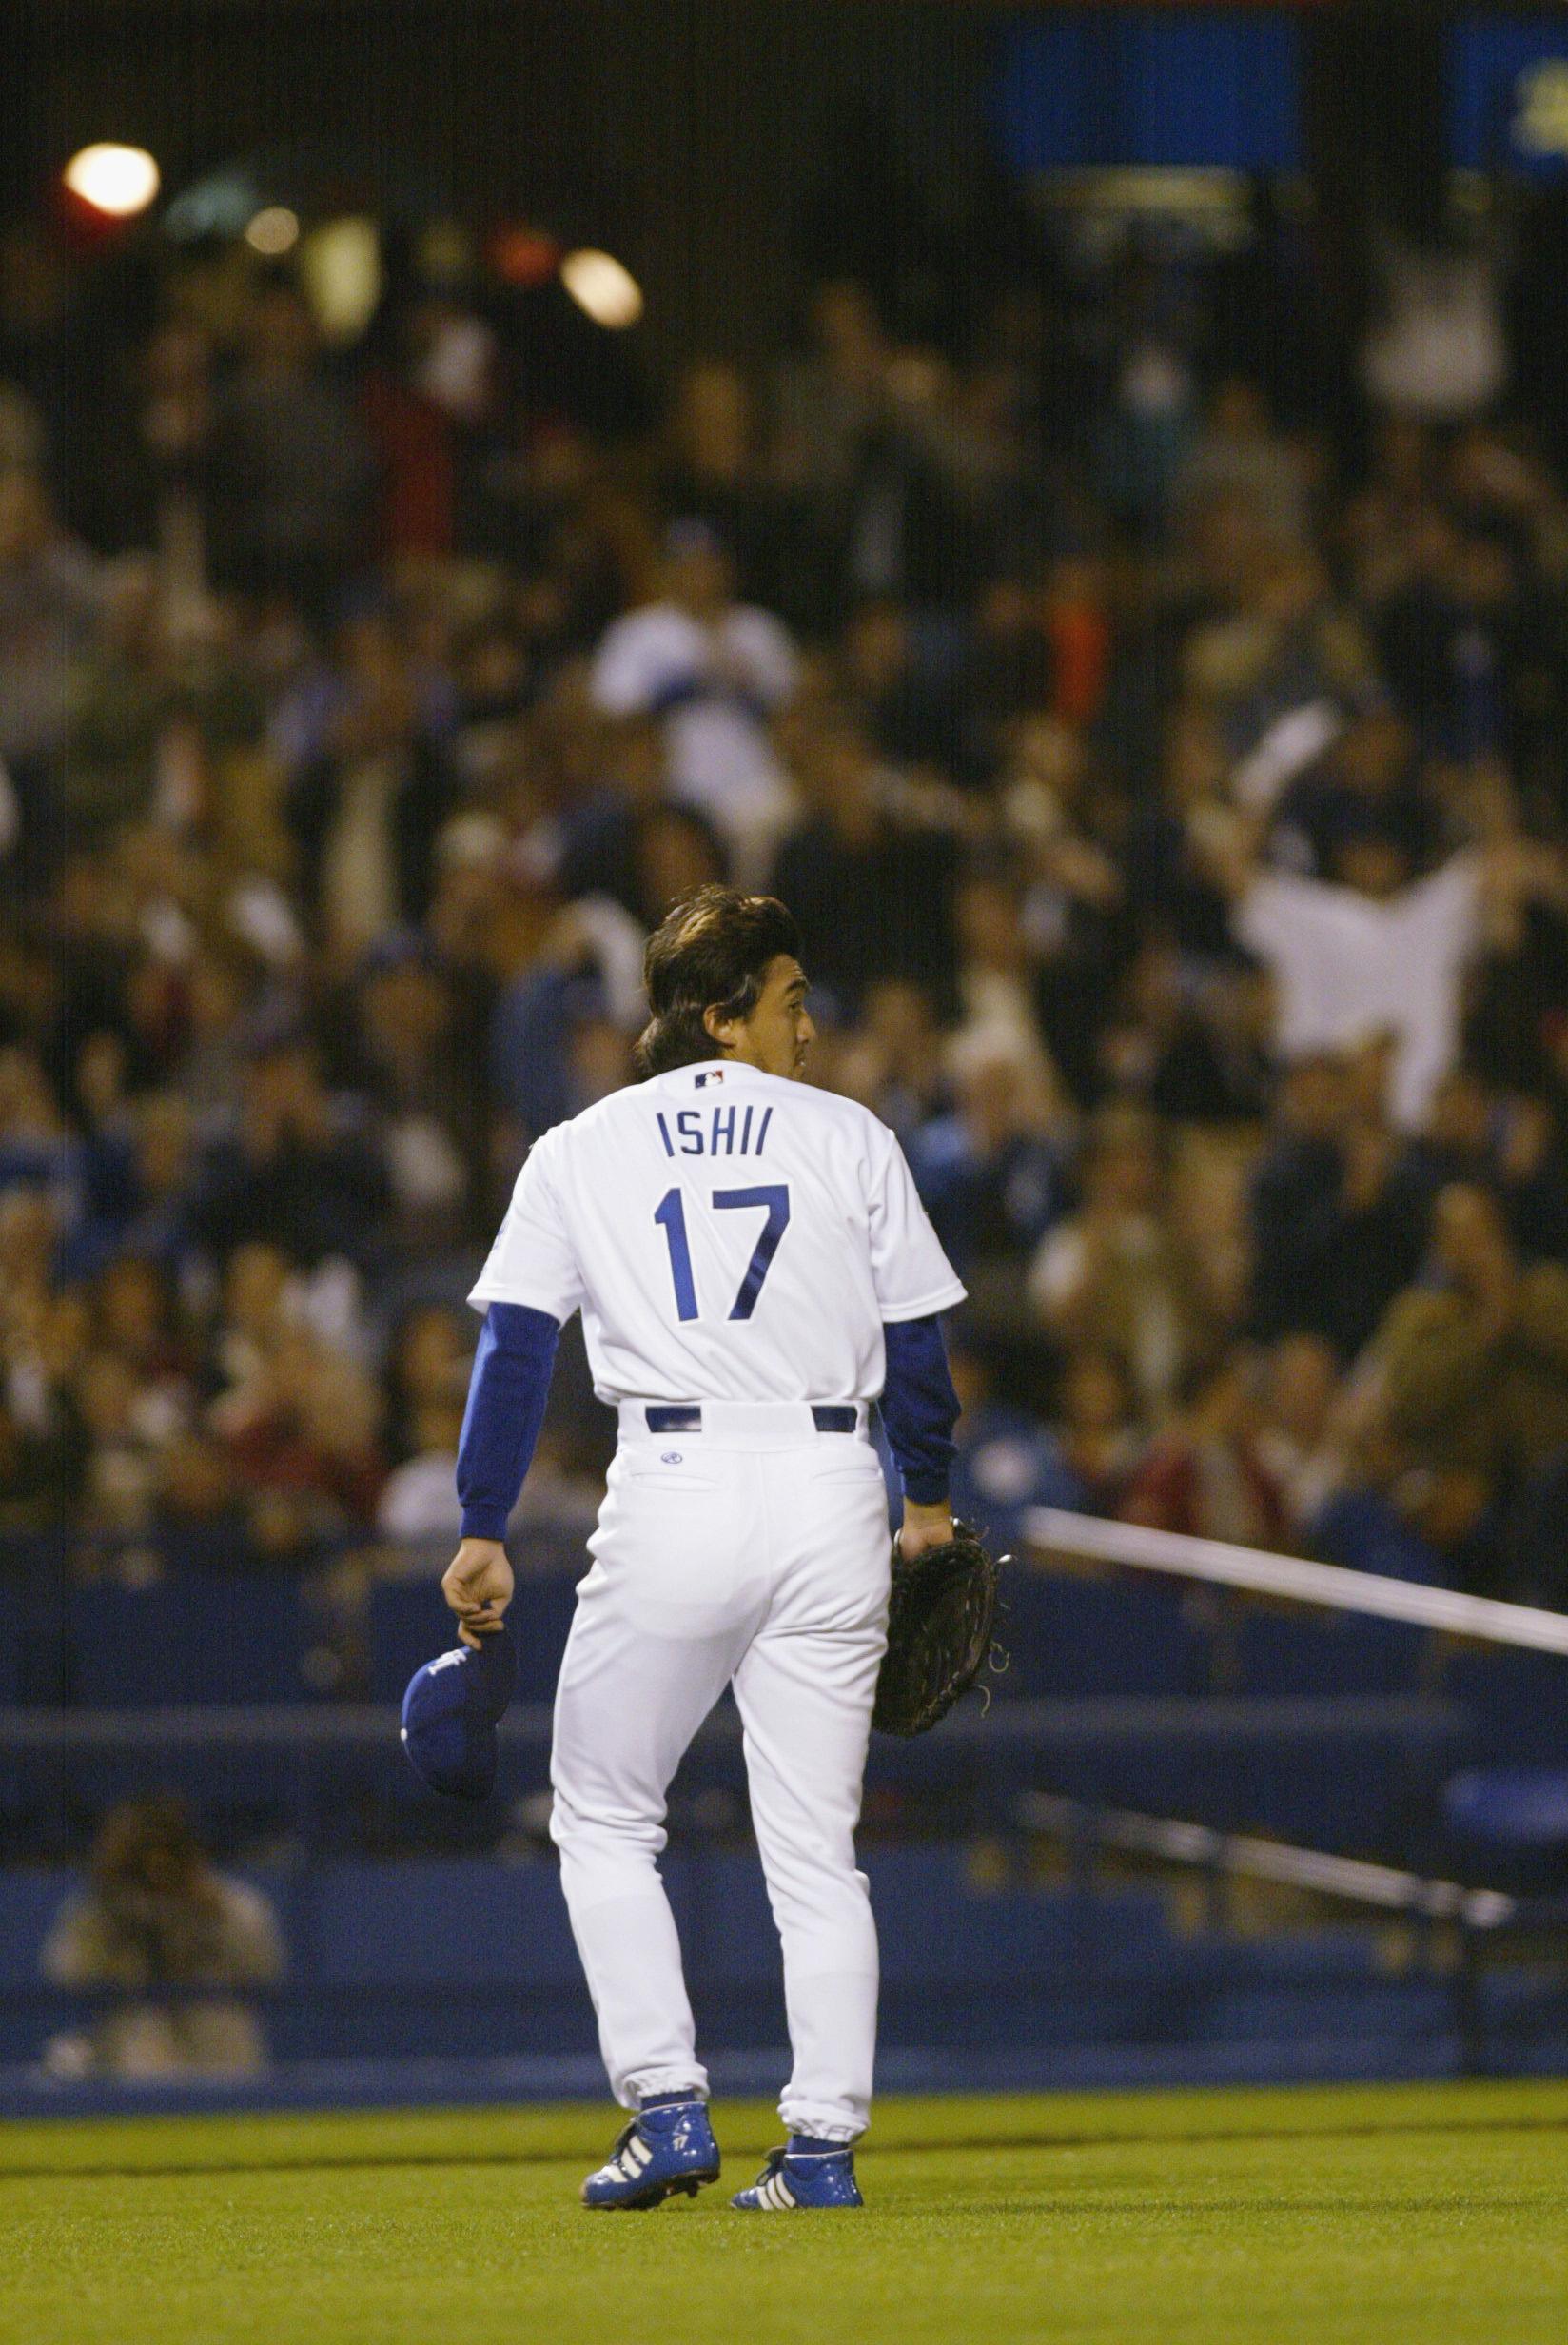 Dodgers magic number is 17 - True Blue LA